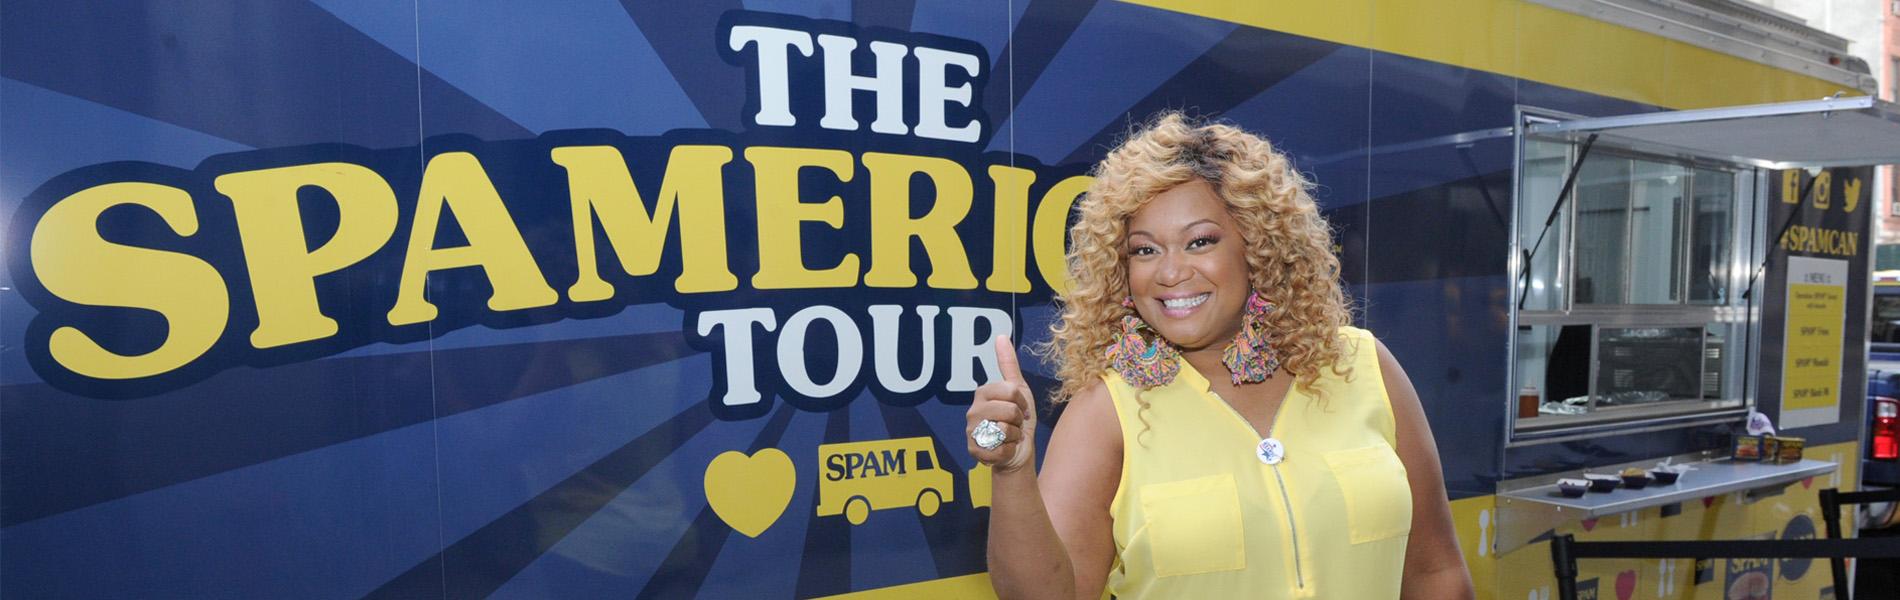 national-spamericantm-food-truck-tour-hero-null-HR